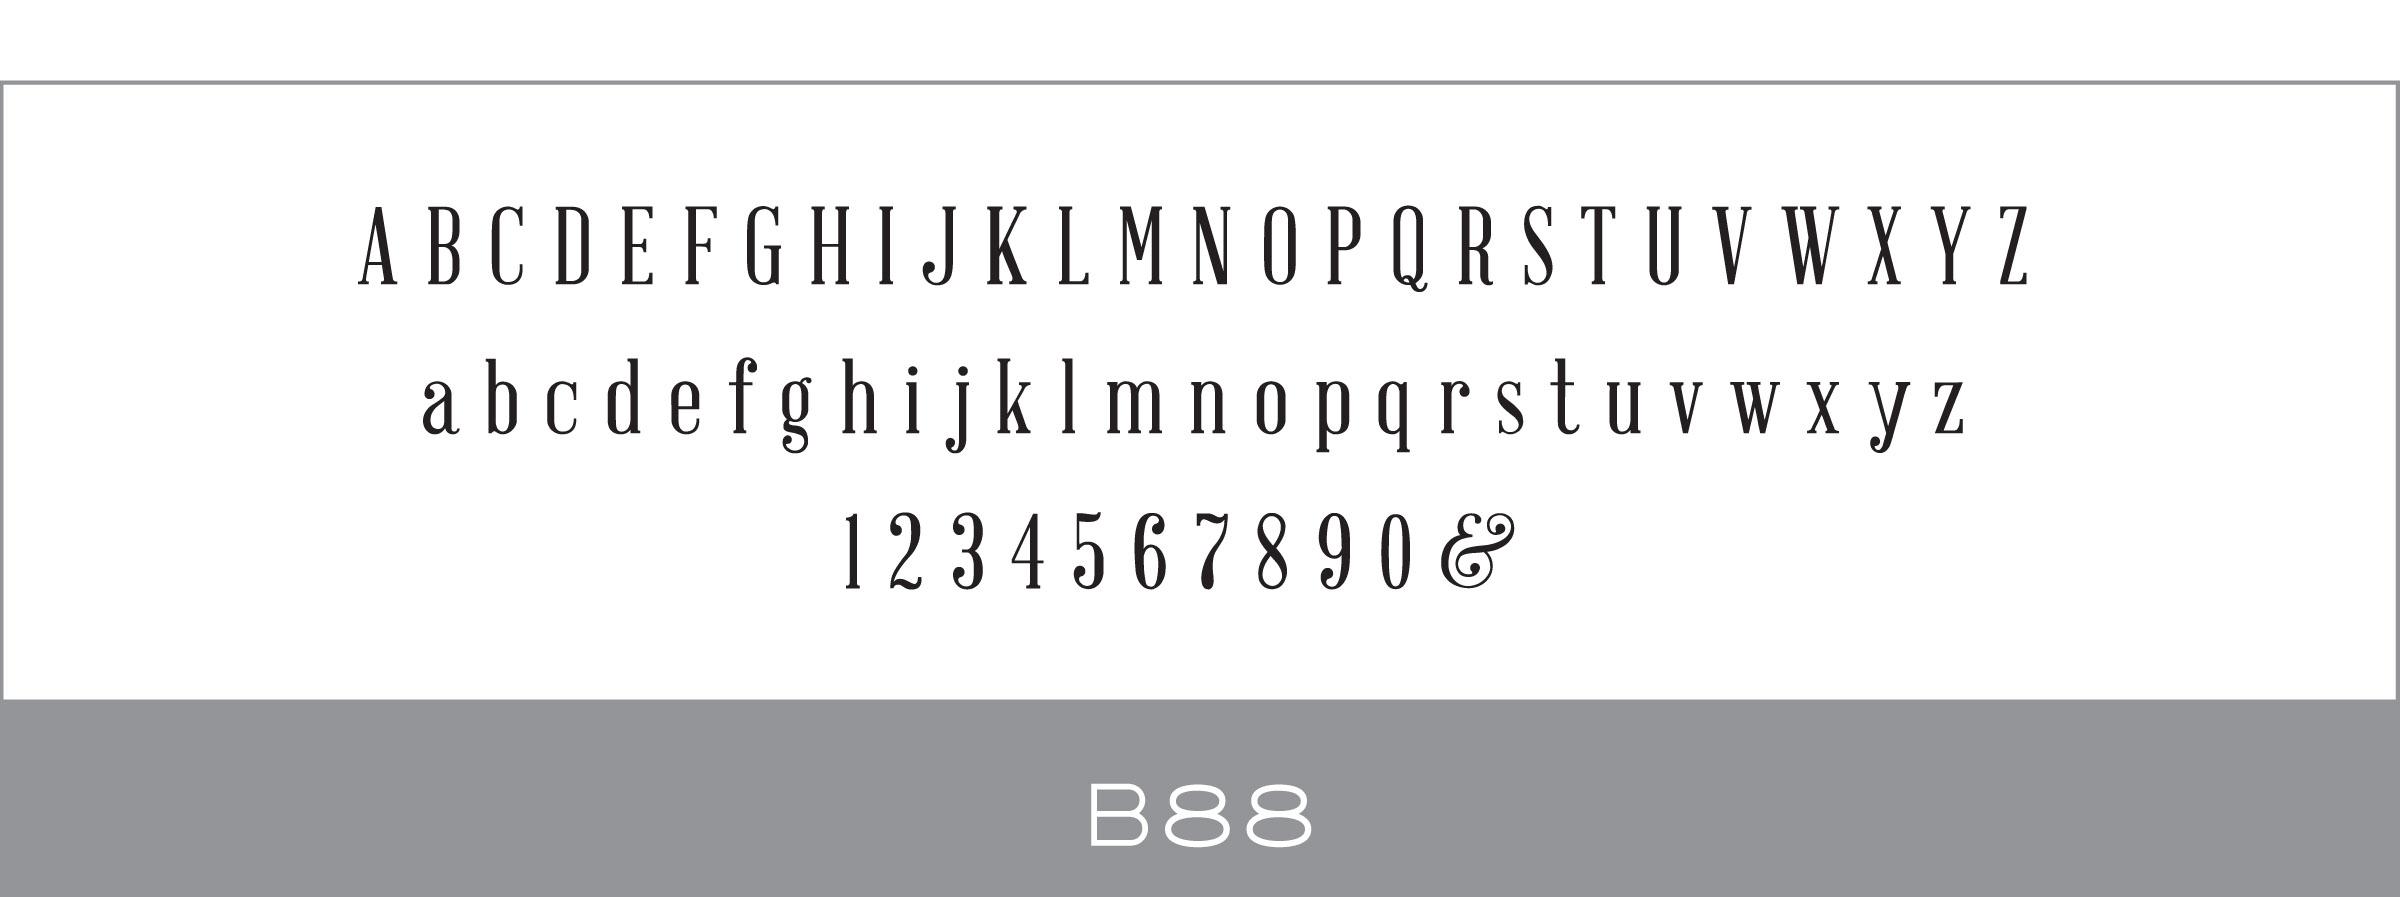 B88_Haute_Papier_Font.jpg